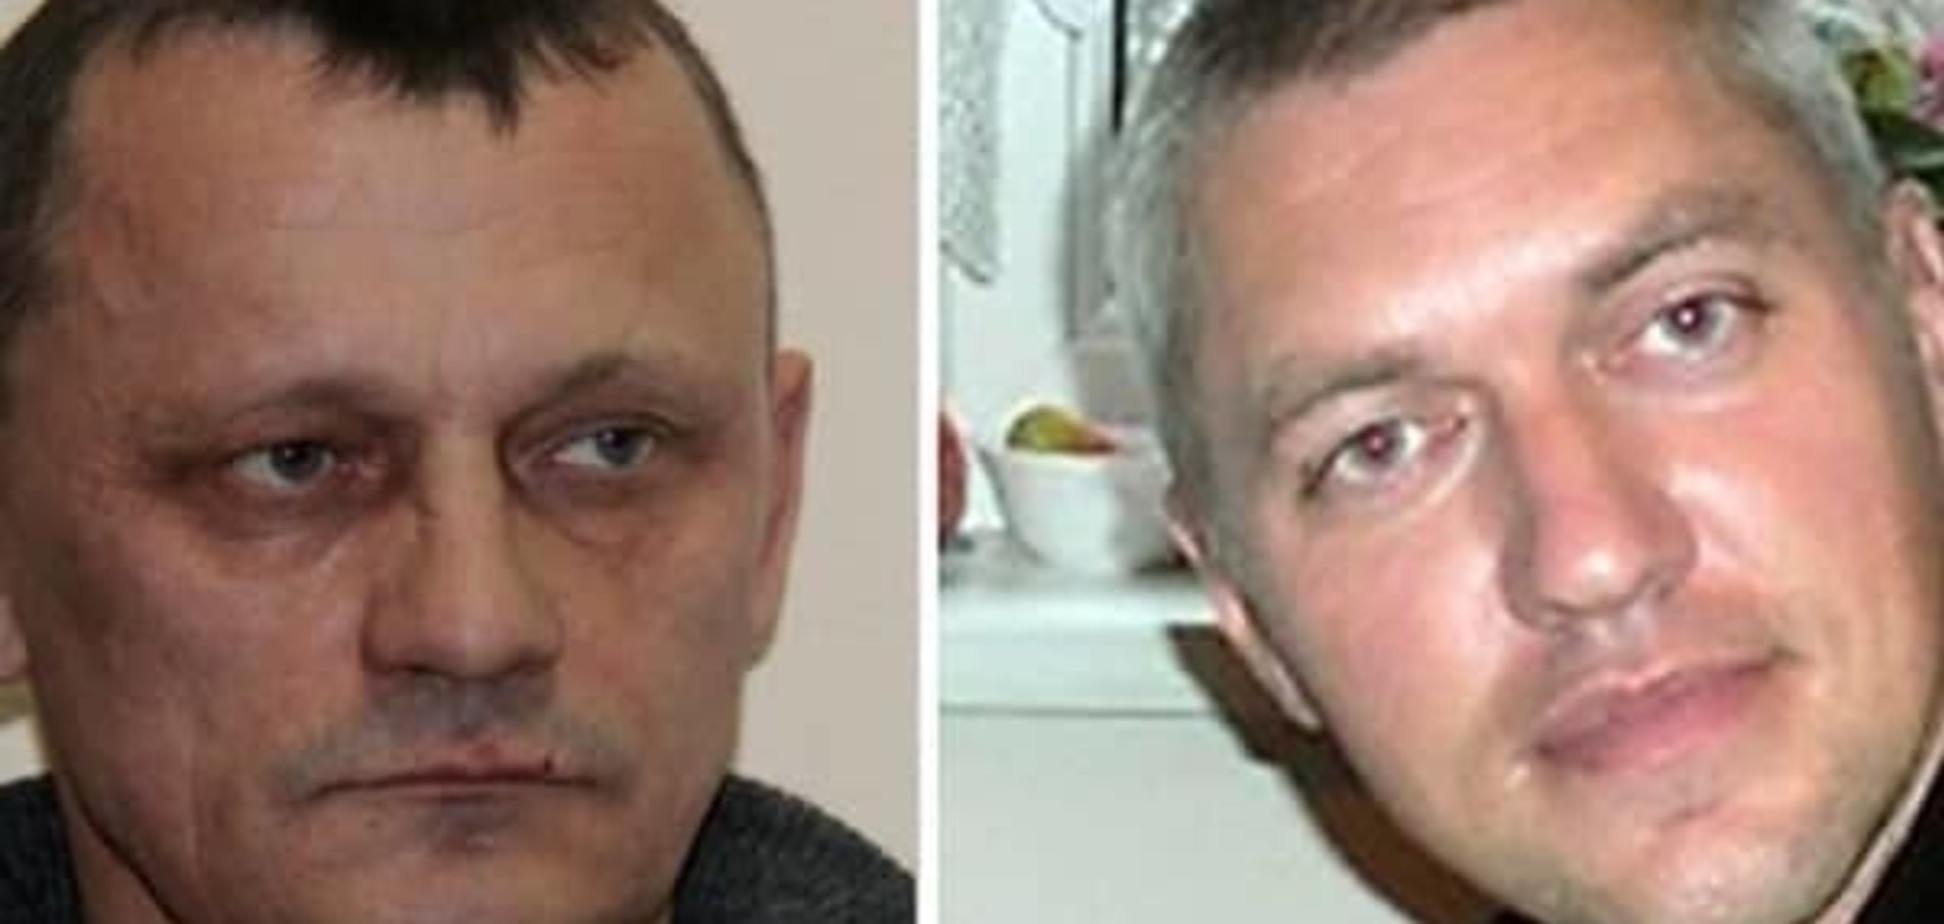 СБУ знайшла алібі для українців, які 'здали Яценюка-чеченця'